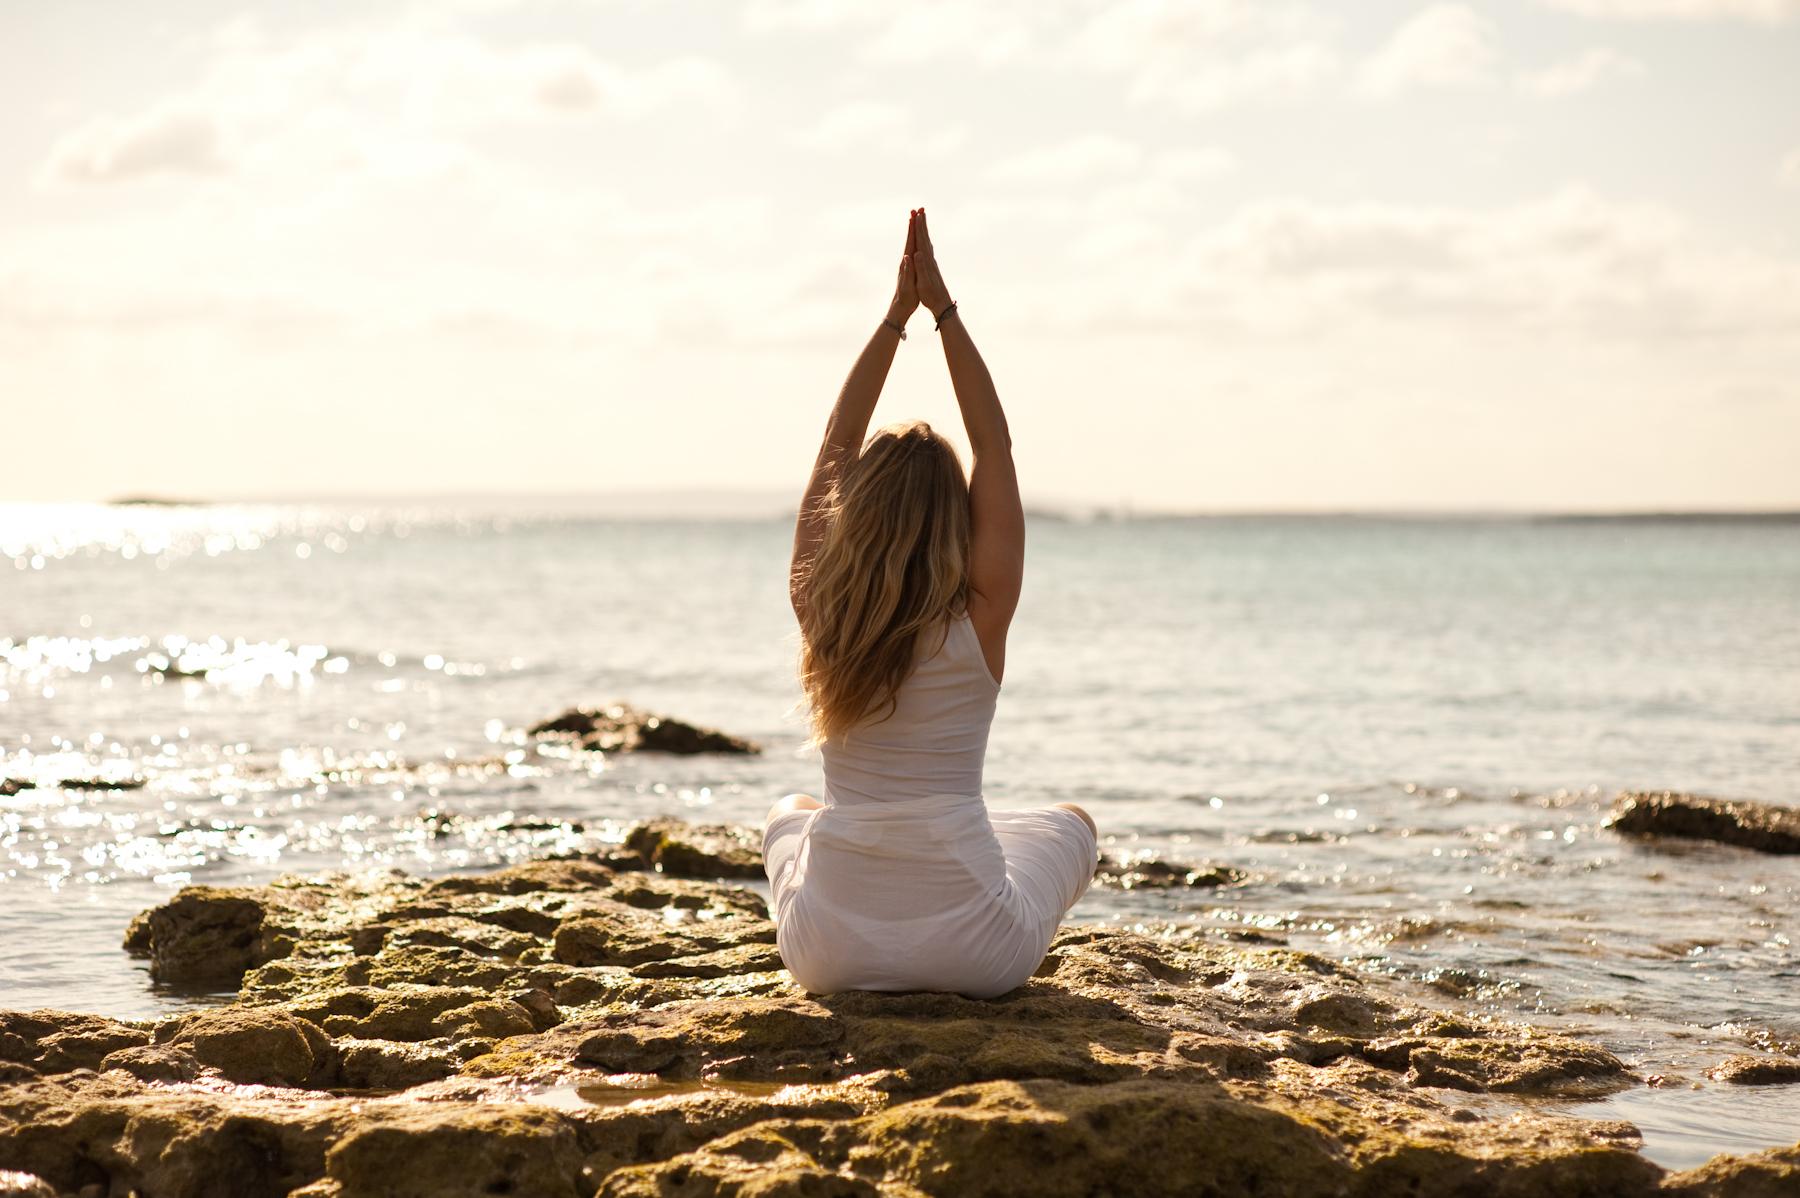 вашему йога на берегу моря фото жилом